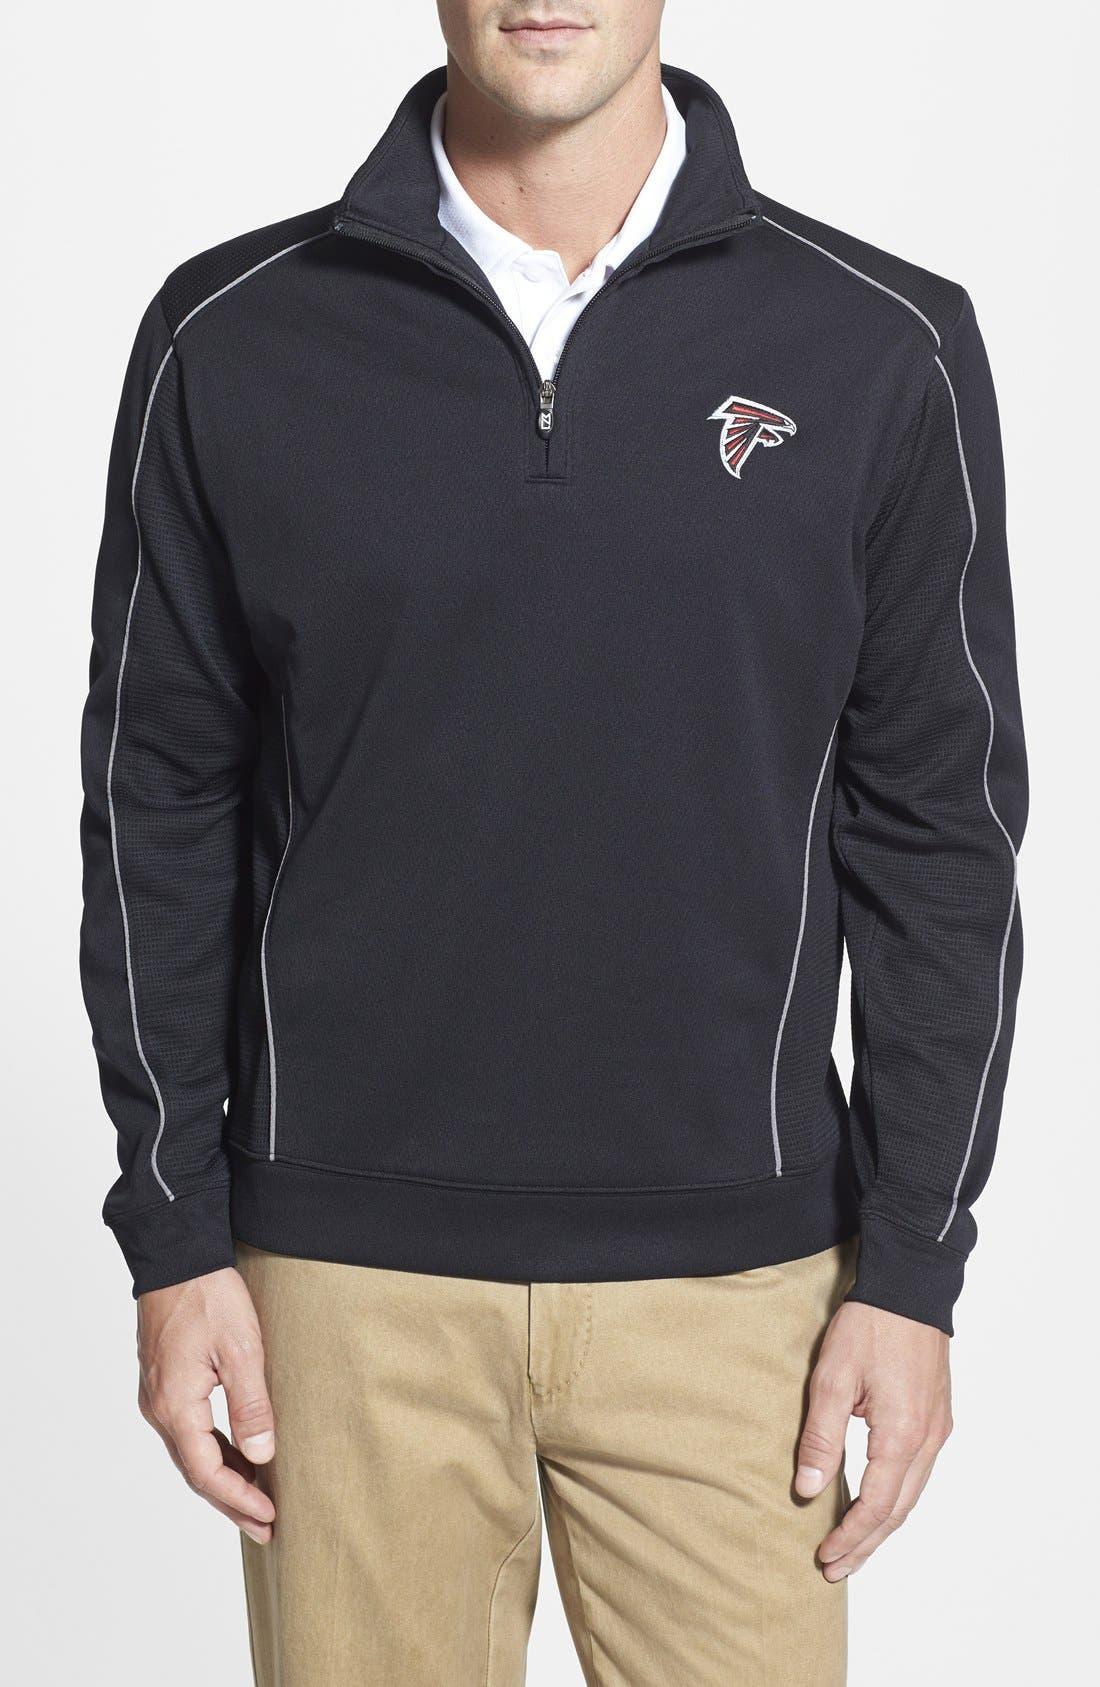 Cutter & Buck Atlanta Falcons - Edge DryTec Moisture Wicking Half Zip Pullover